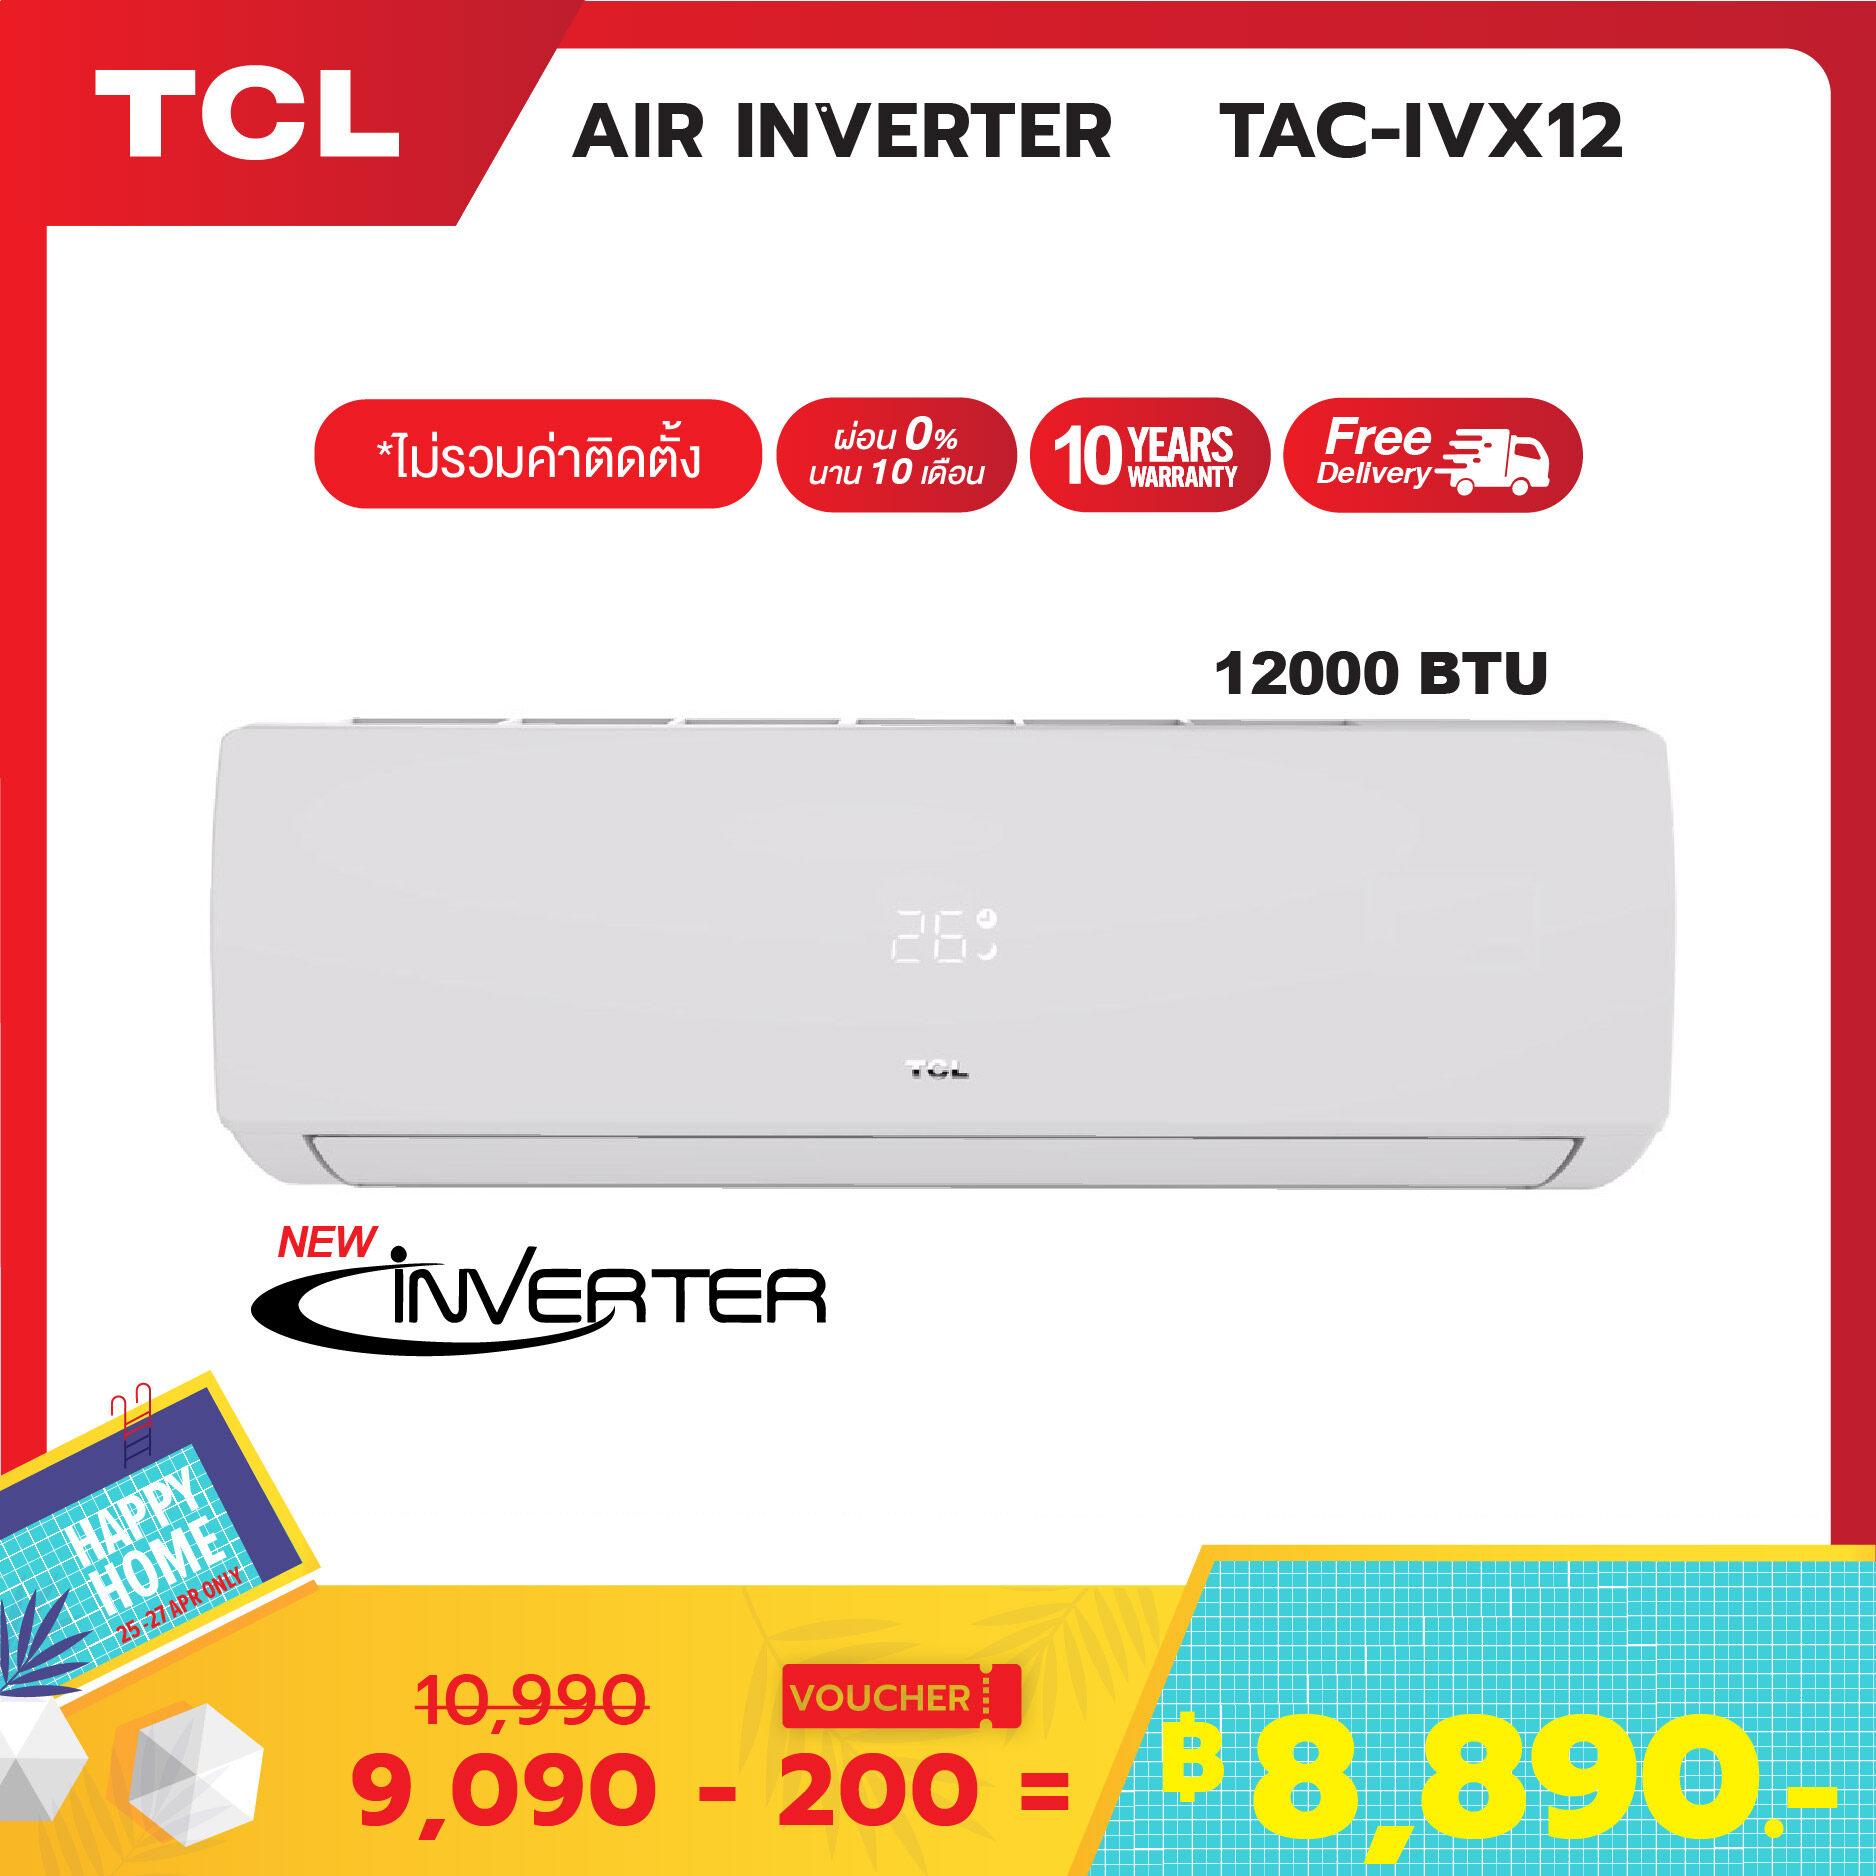 Tcl เครื่องปรับอากาศติดผนังระบบ Inverter New Elite Series ขนาด 12,000 Btu รุ่น Tac-Ivx12 (ไม่รวมค่าติดตั้ง).